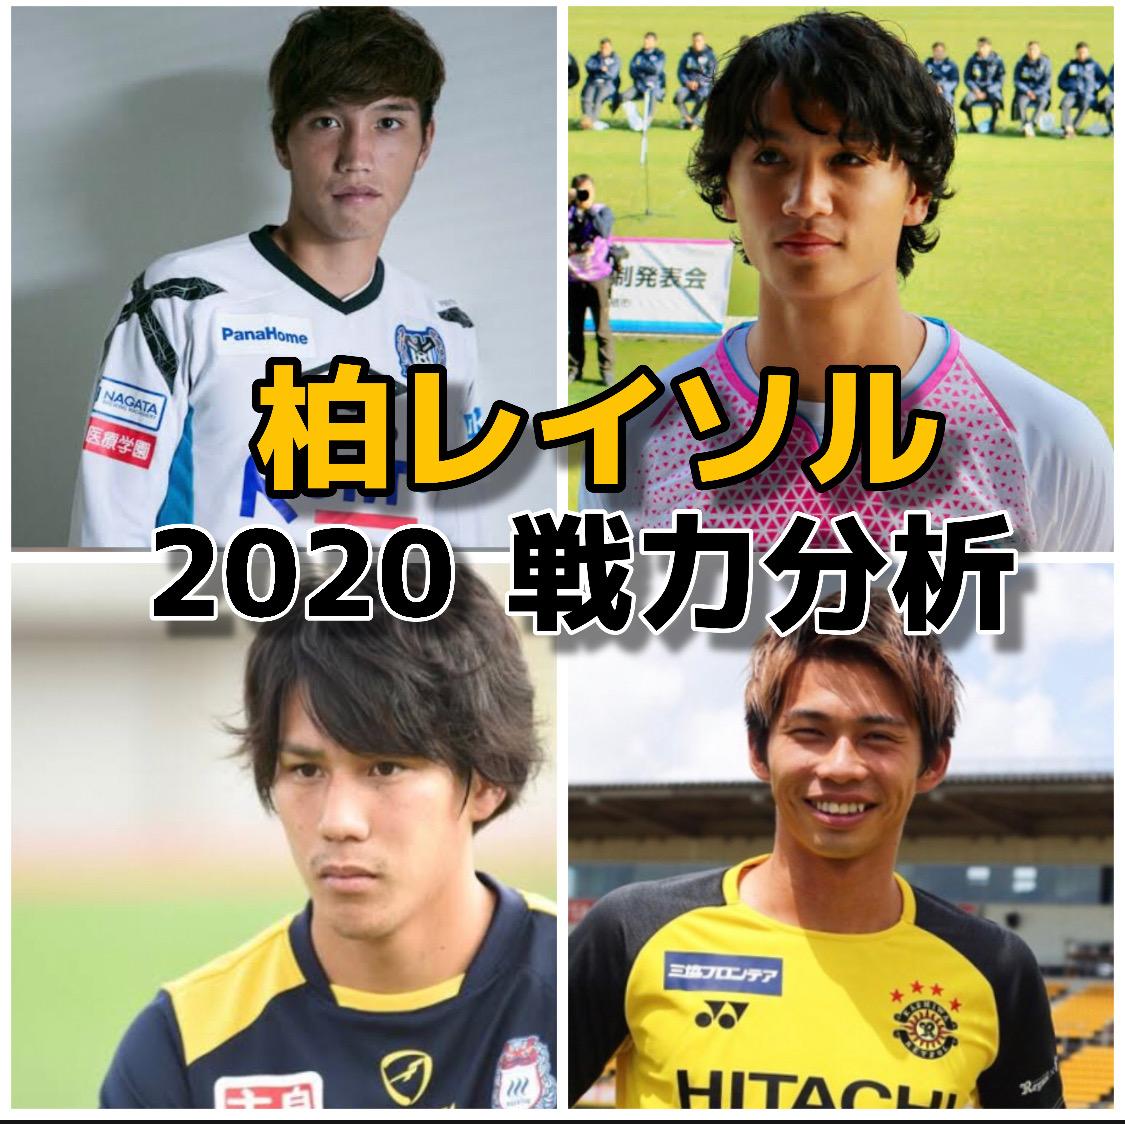 f:id:yamadaman0618:20200204204458j:plain